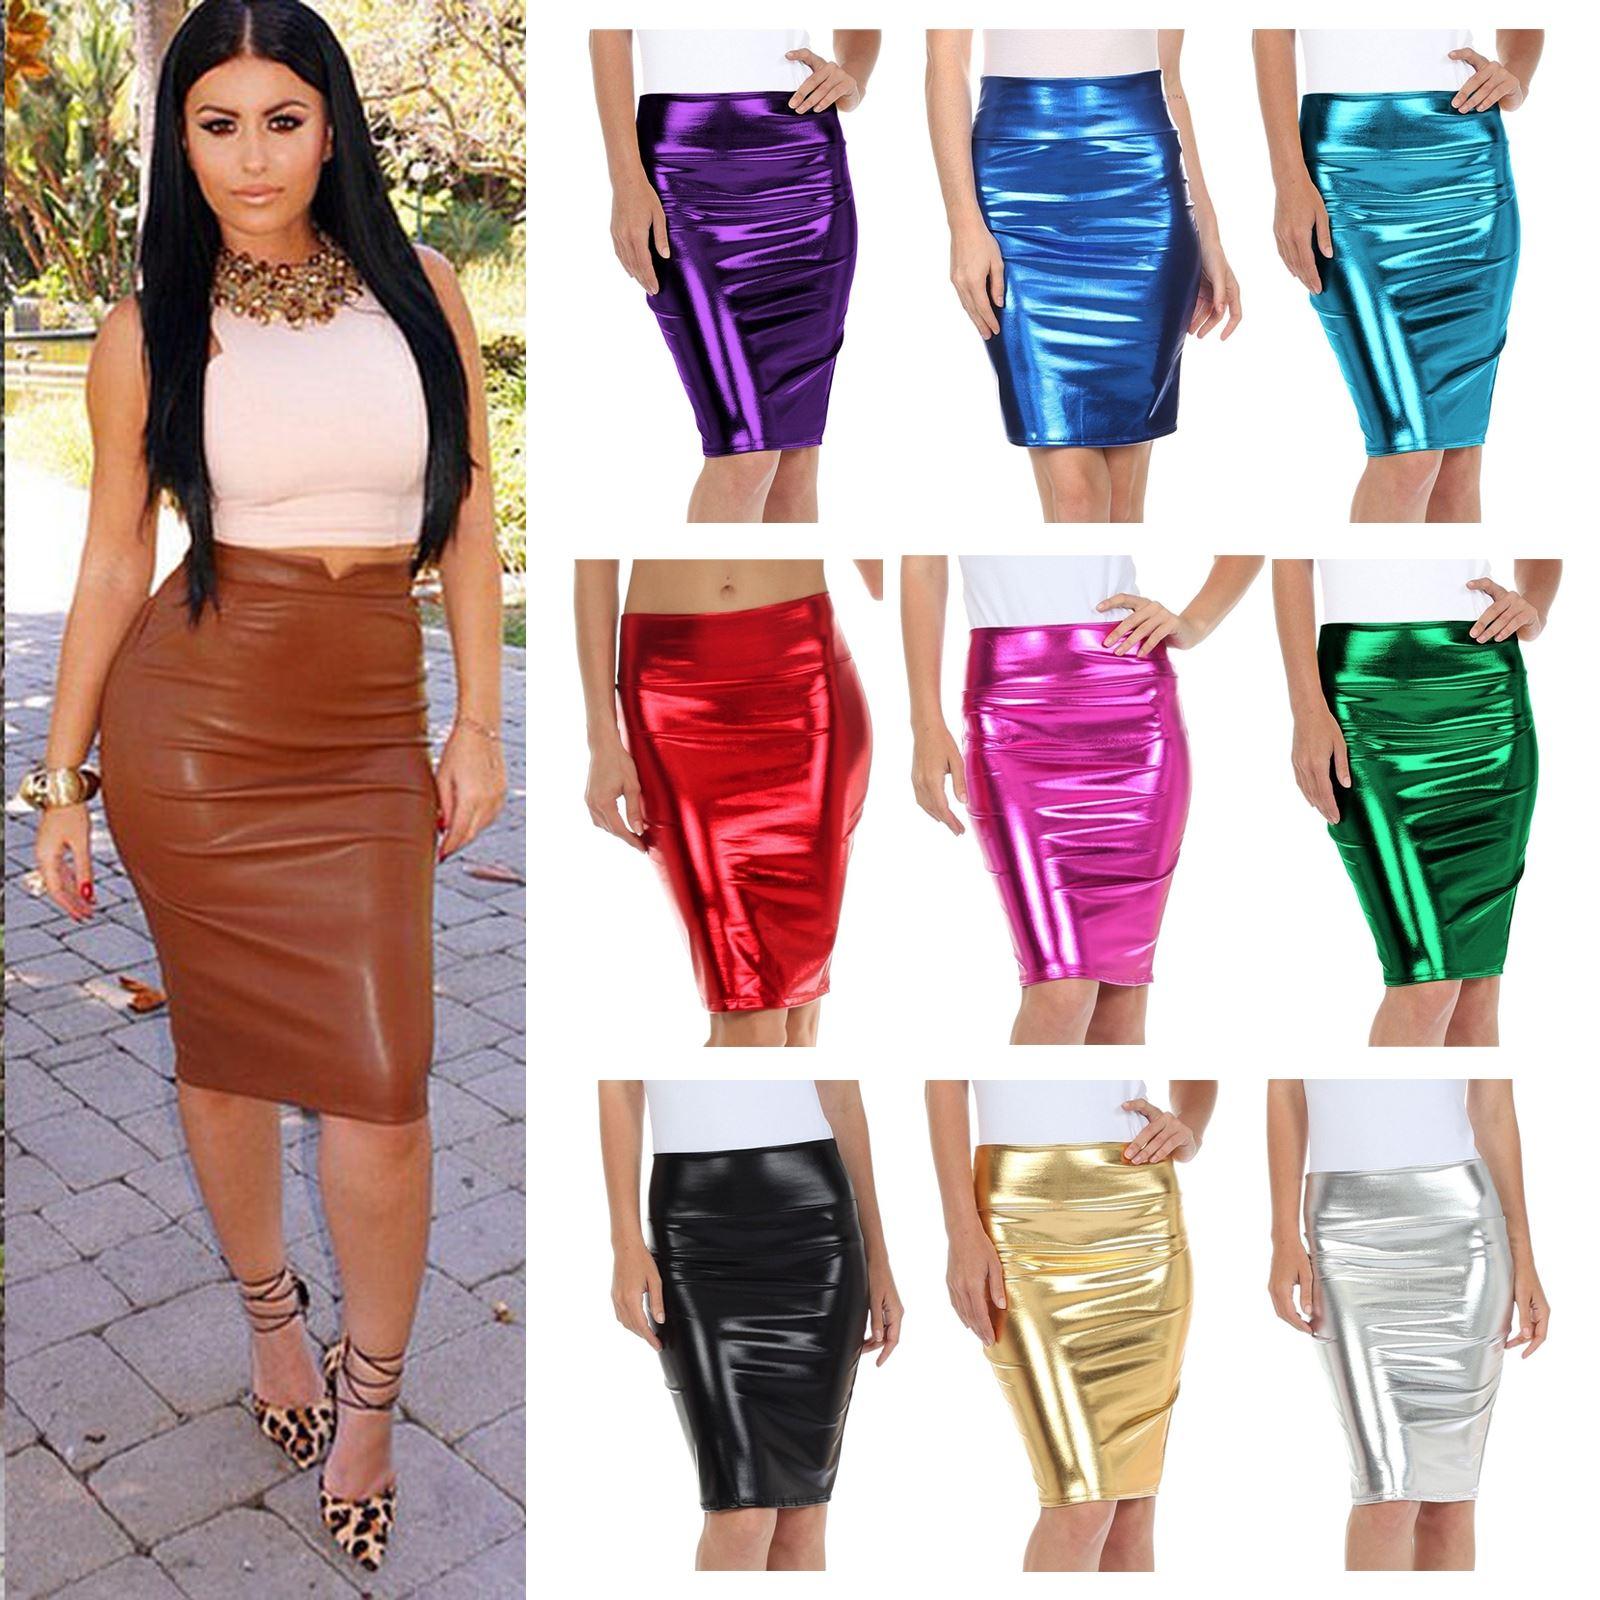 920ee1c654 New Women High Waist Wetlook PVC Leather Shiny Metallic Liquid Pencil Midi  Skirt